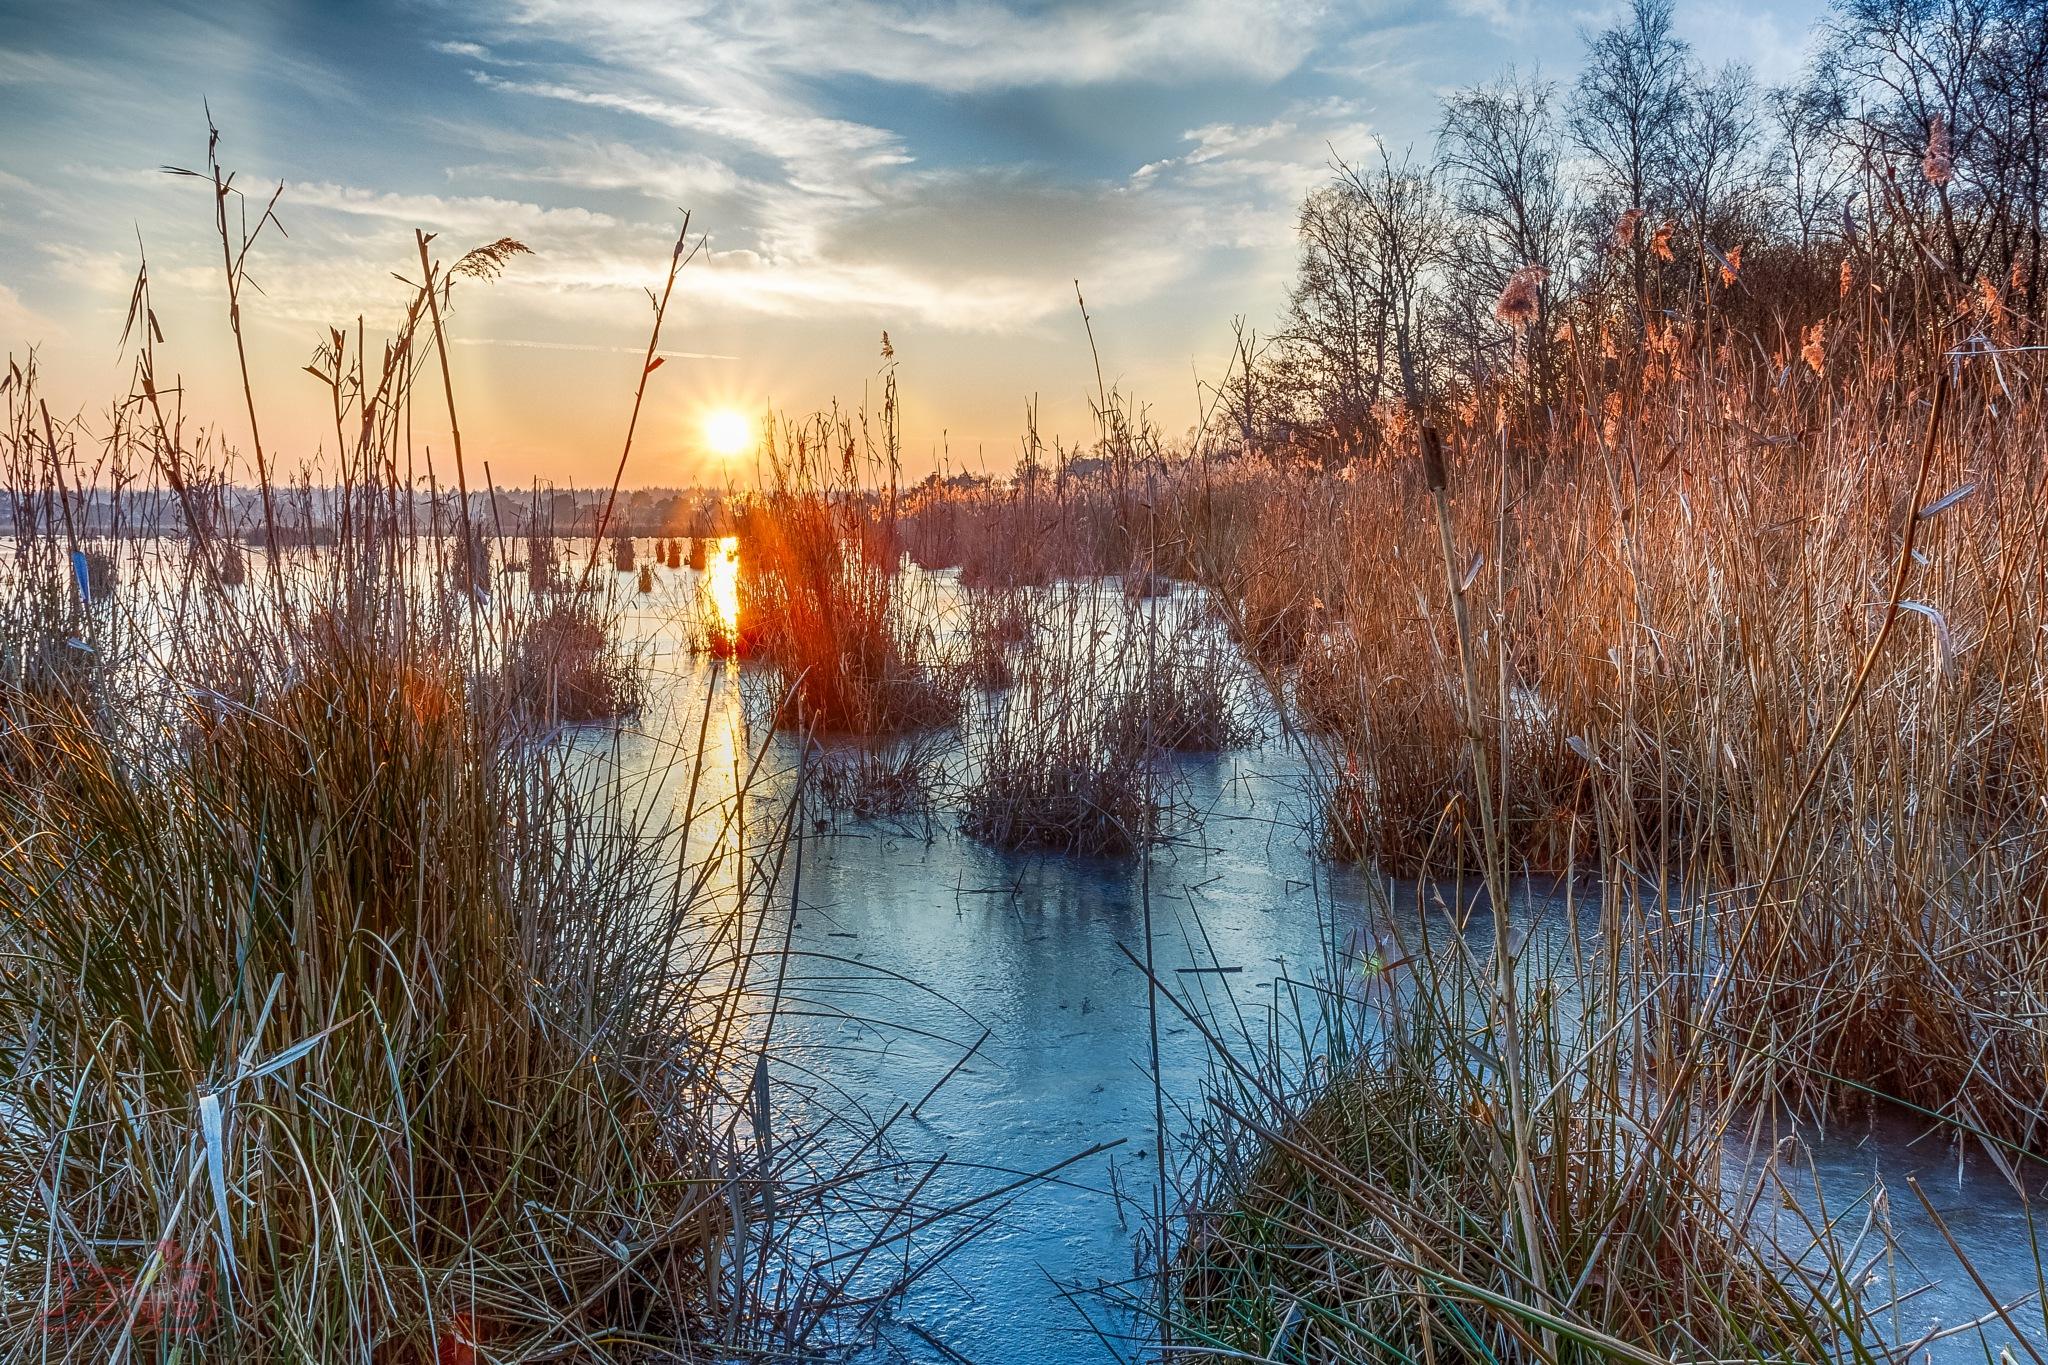 The frozen lake #1 by Jorge Botelho